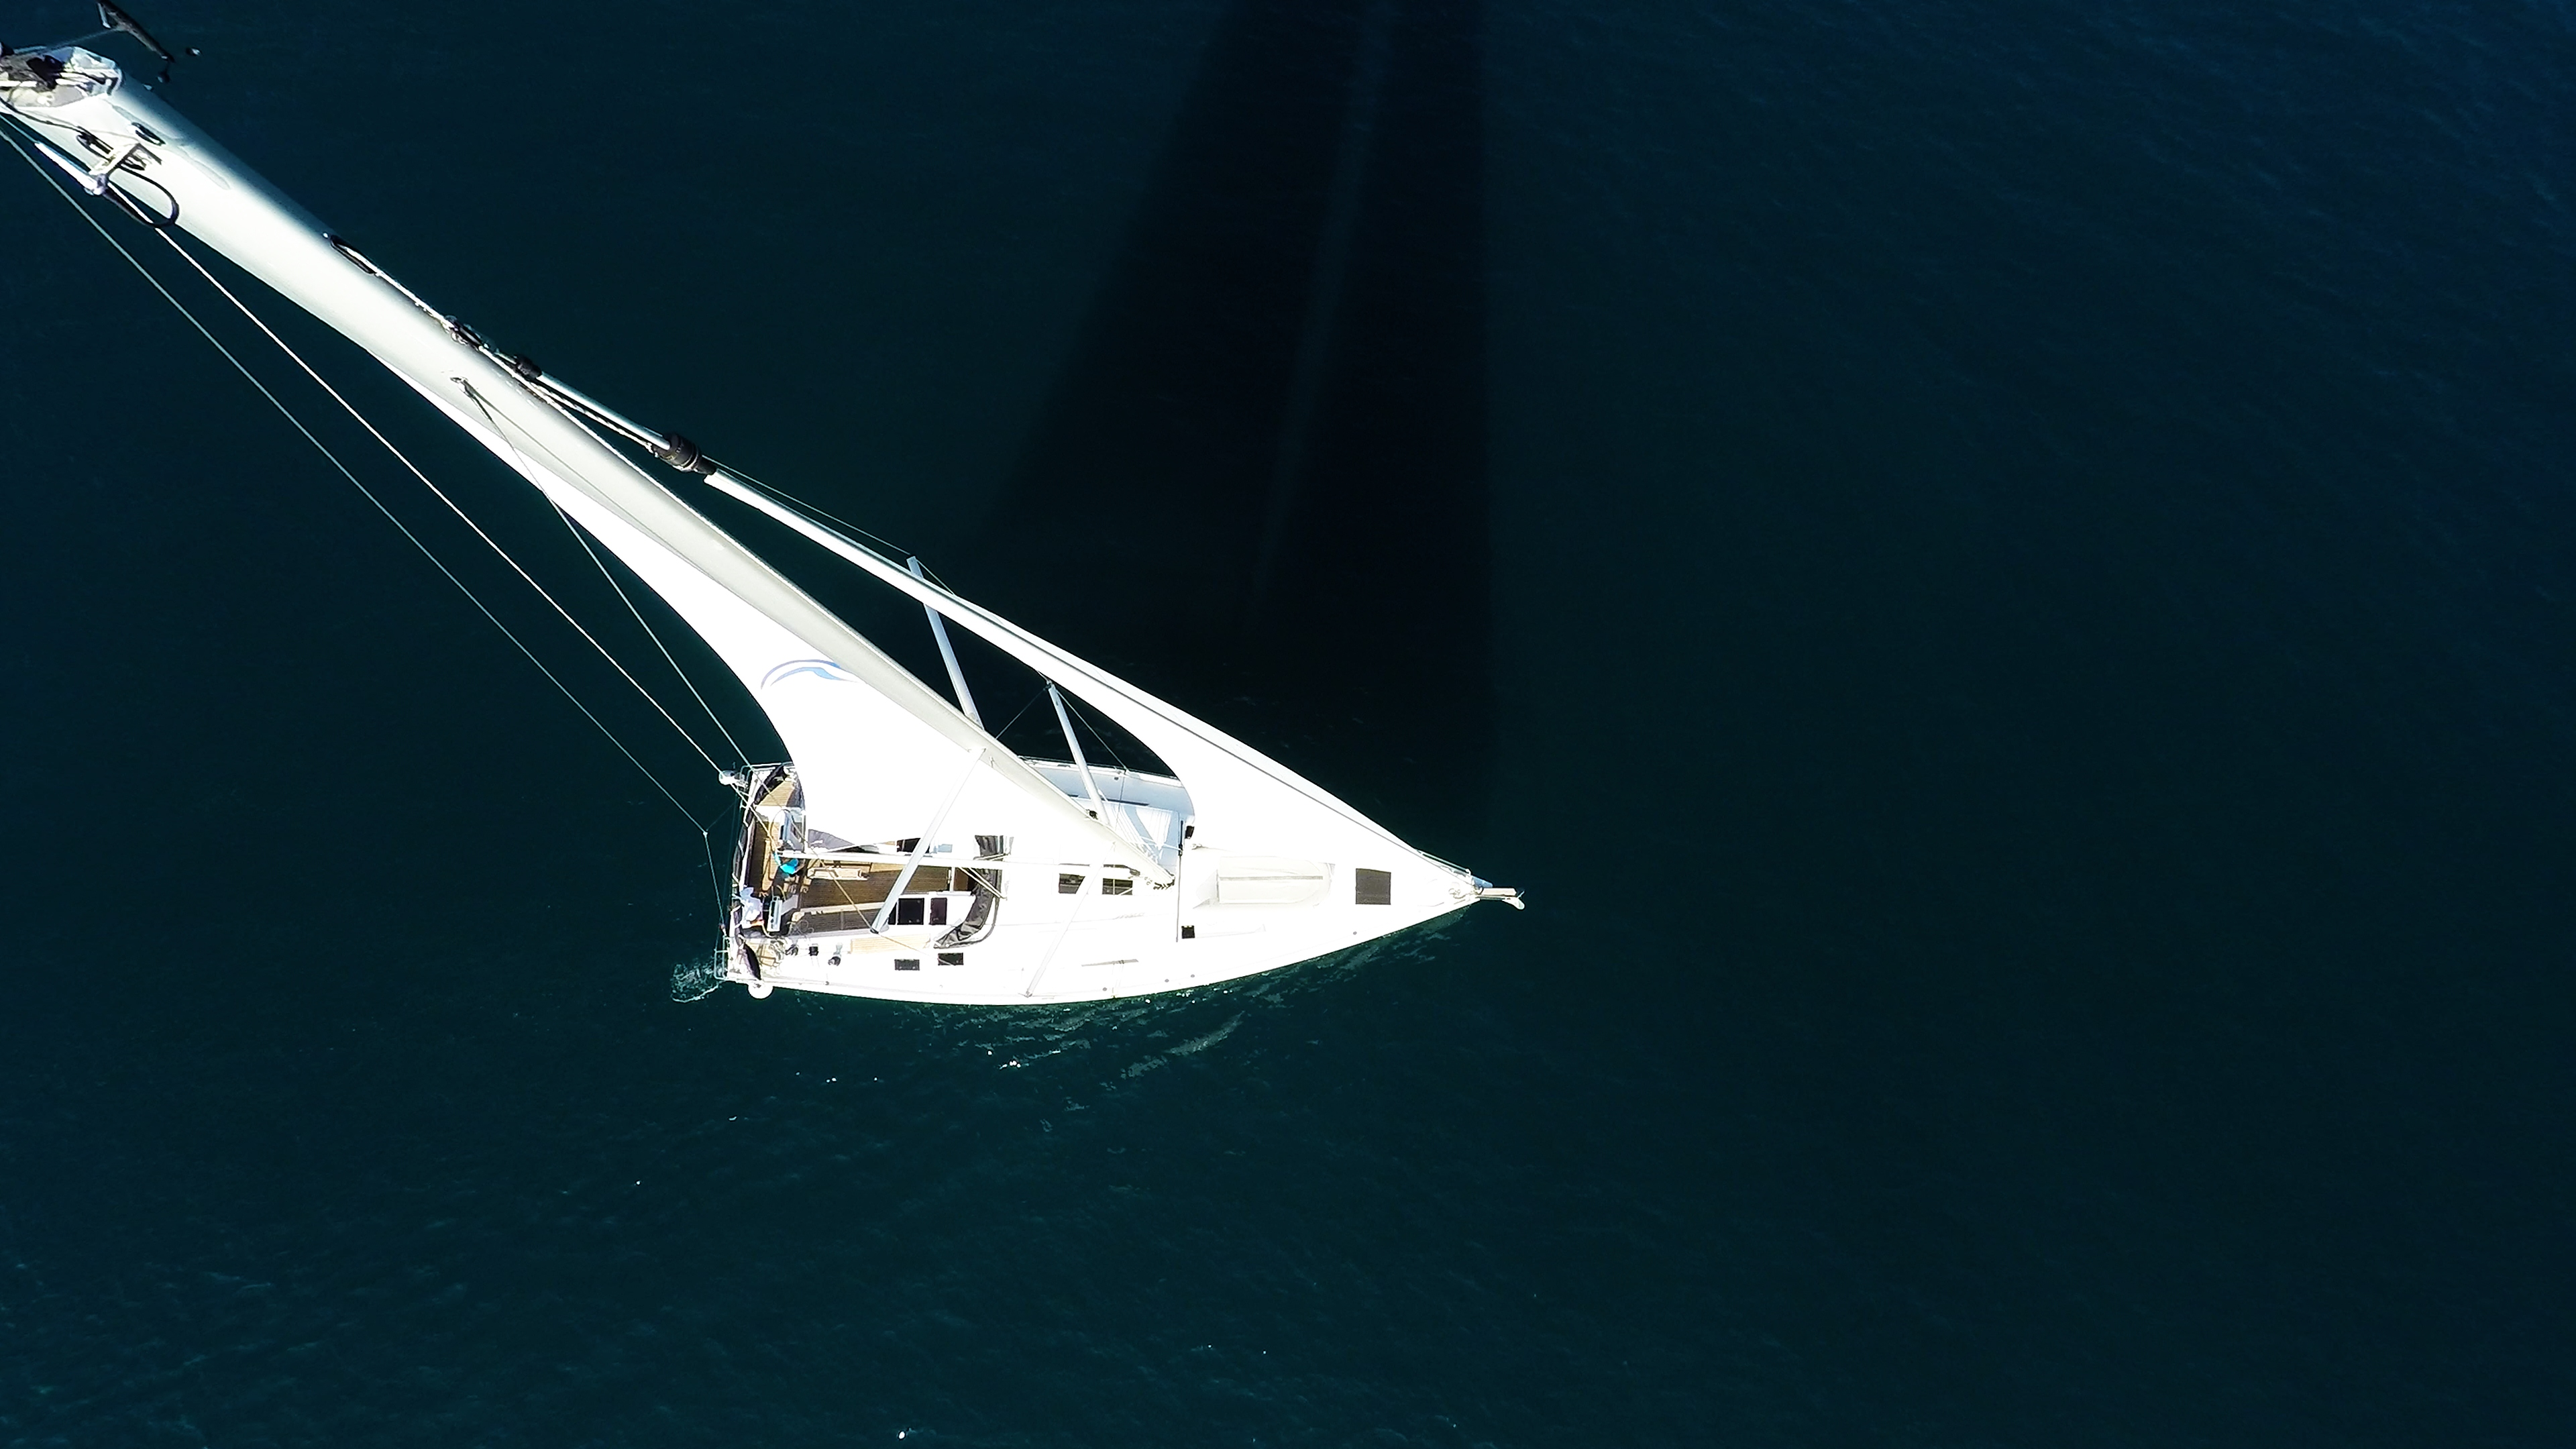 vrh jarbola snast jedra jedrilica morsko plavetnilo